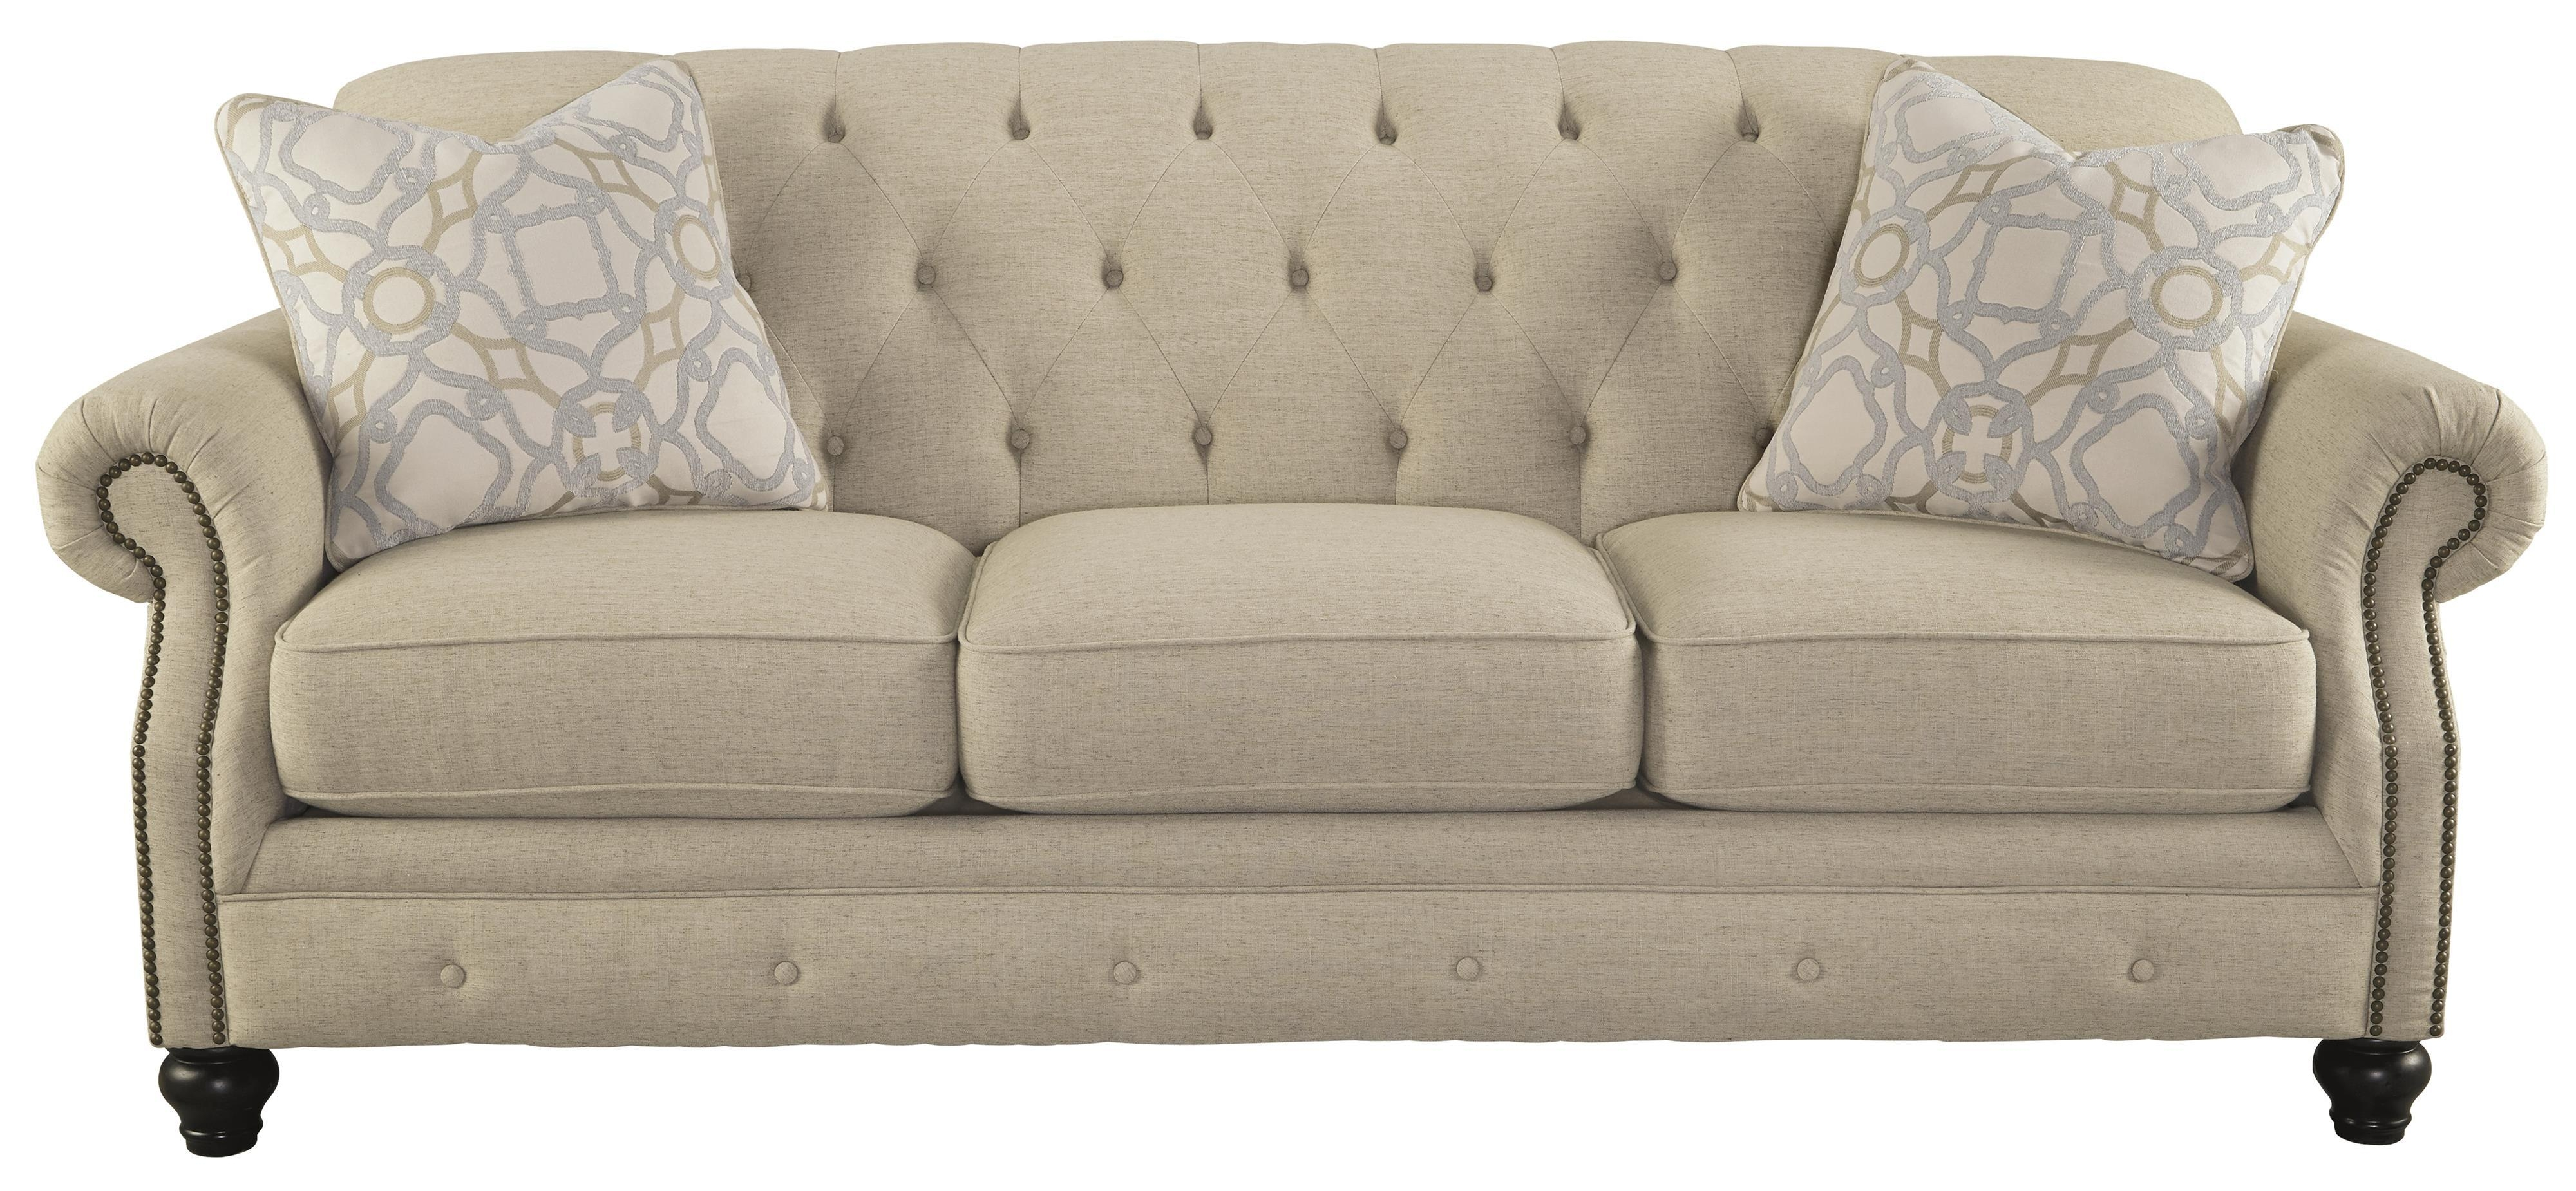 Signature Designashley Kieran Traditional Sofa With Tufted Throughout Ashley Tufted Sofa (View 4 of 20)